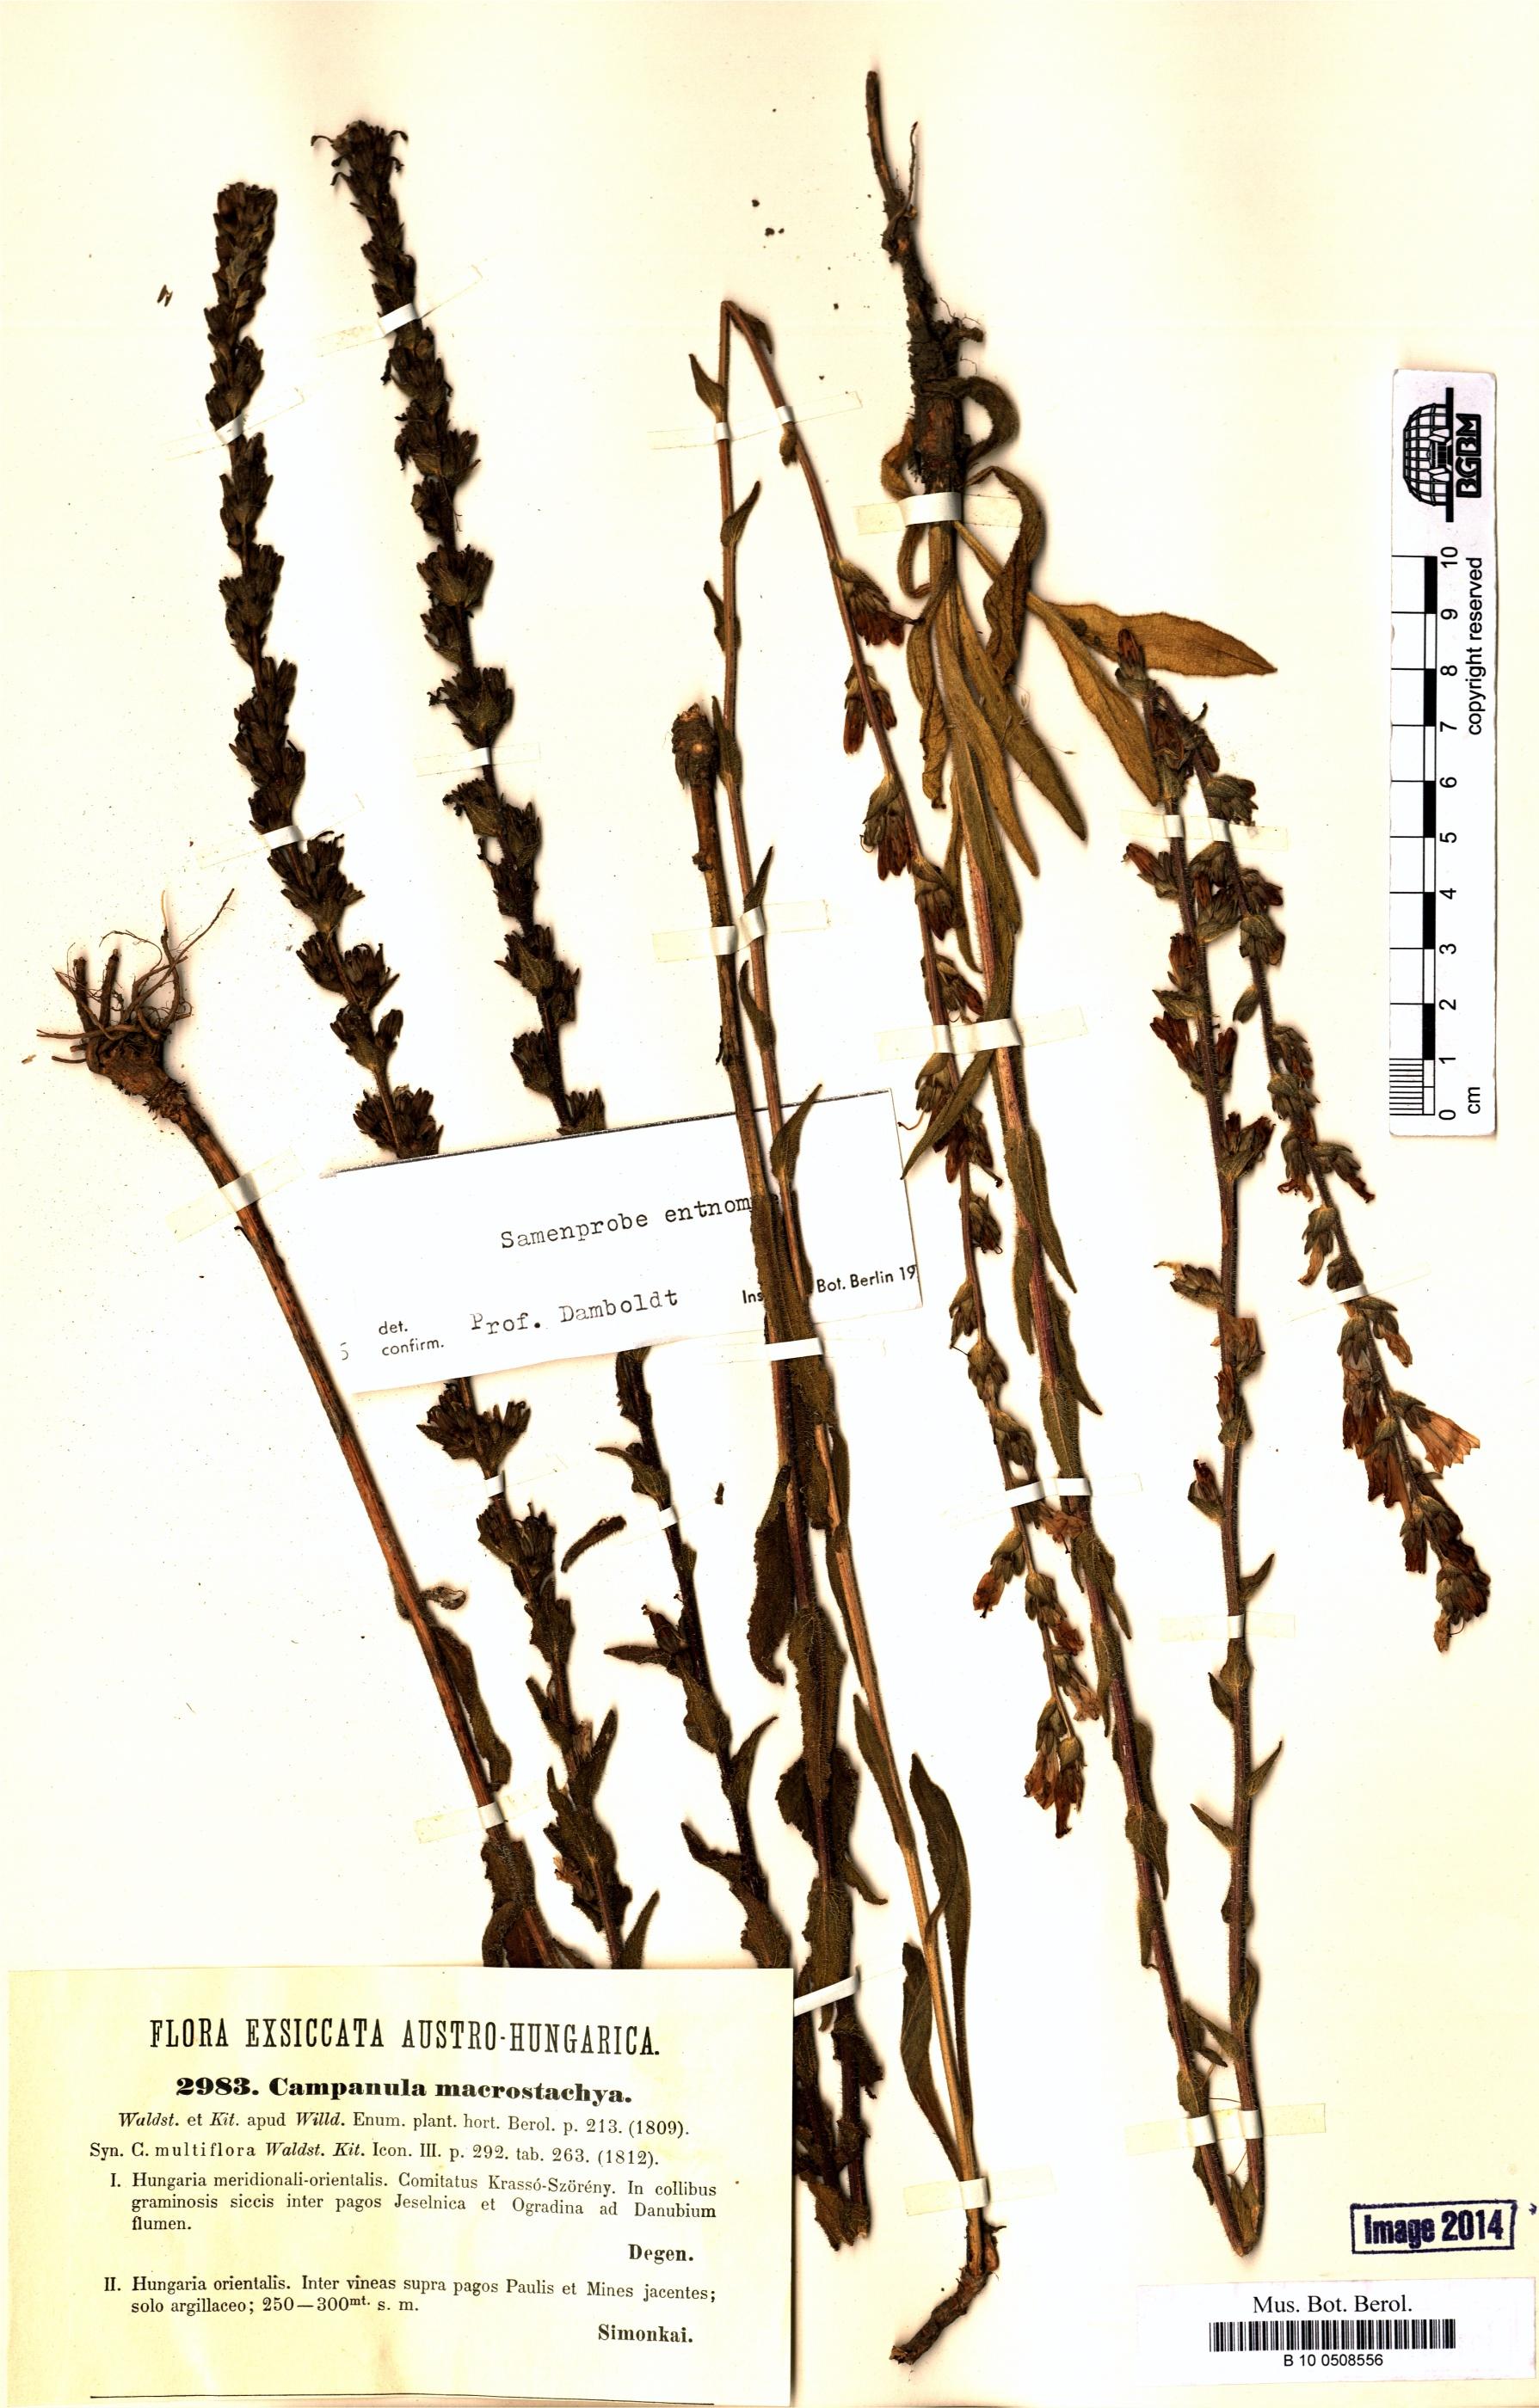 http://ww2.bgbm.org/herbarium/images/B/10/05/08/55/B_10_0508556.jpg